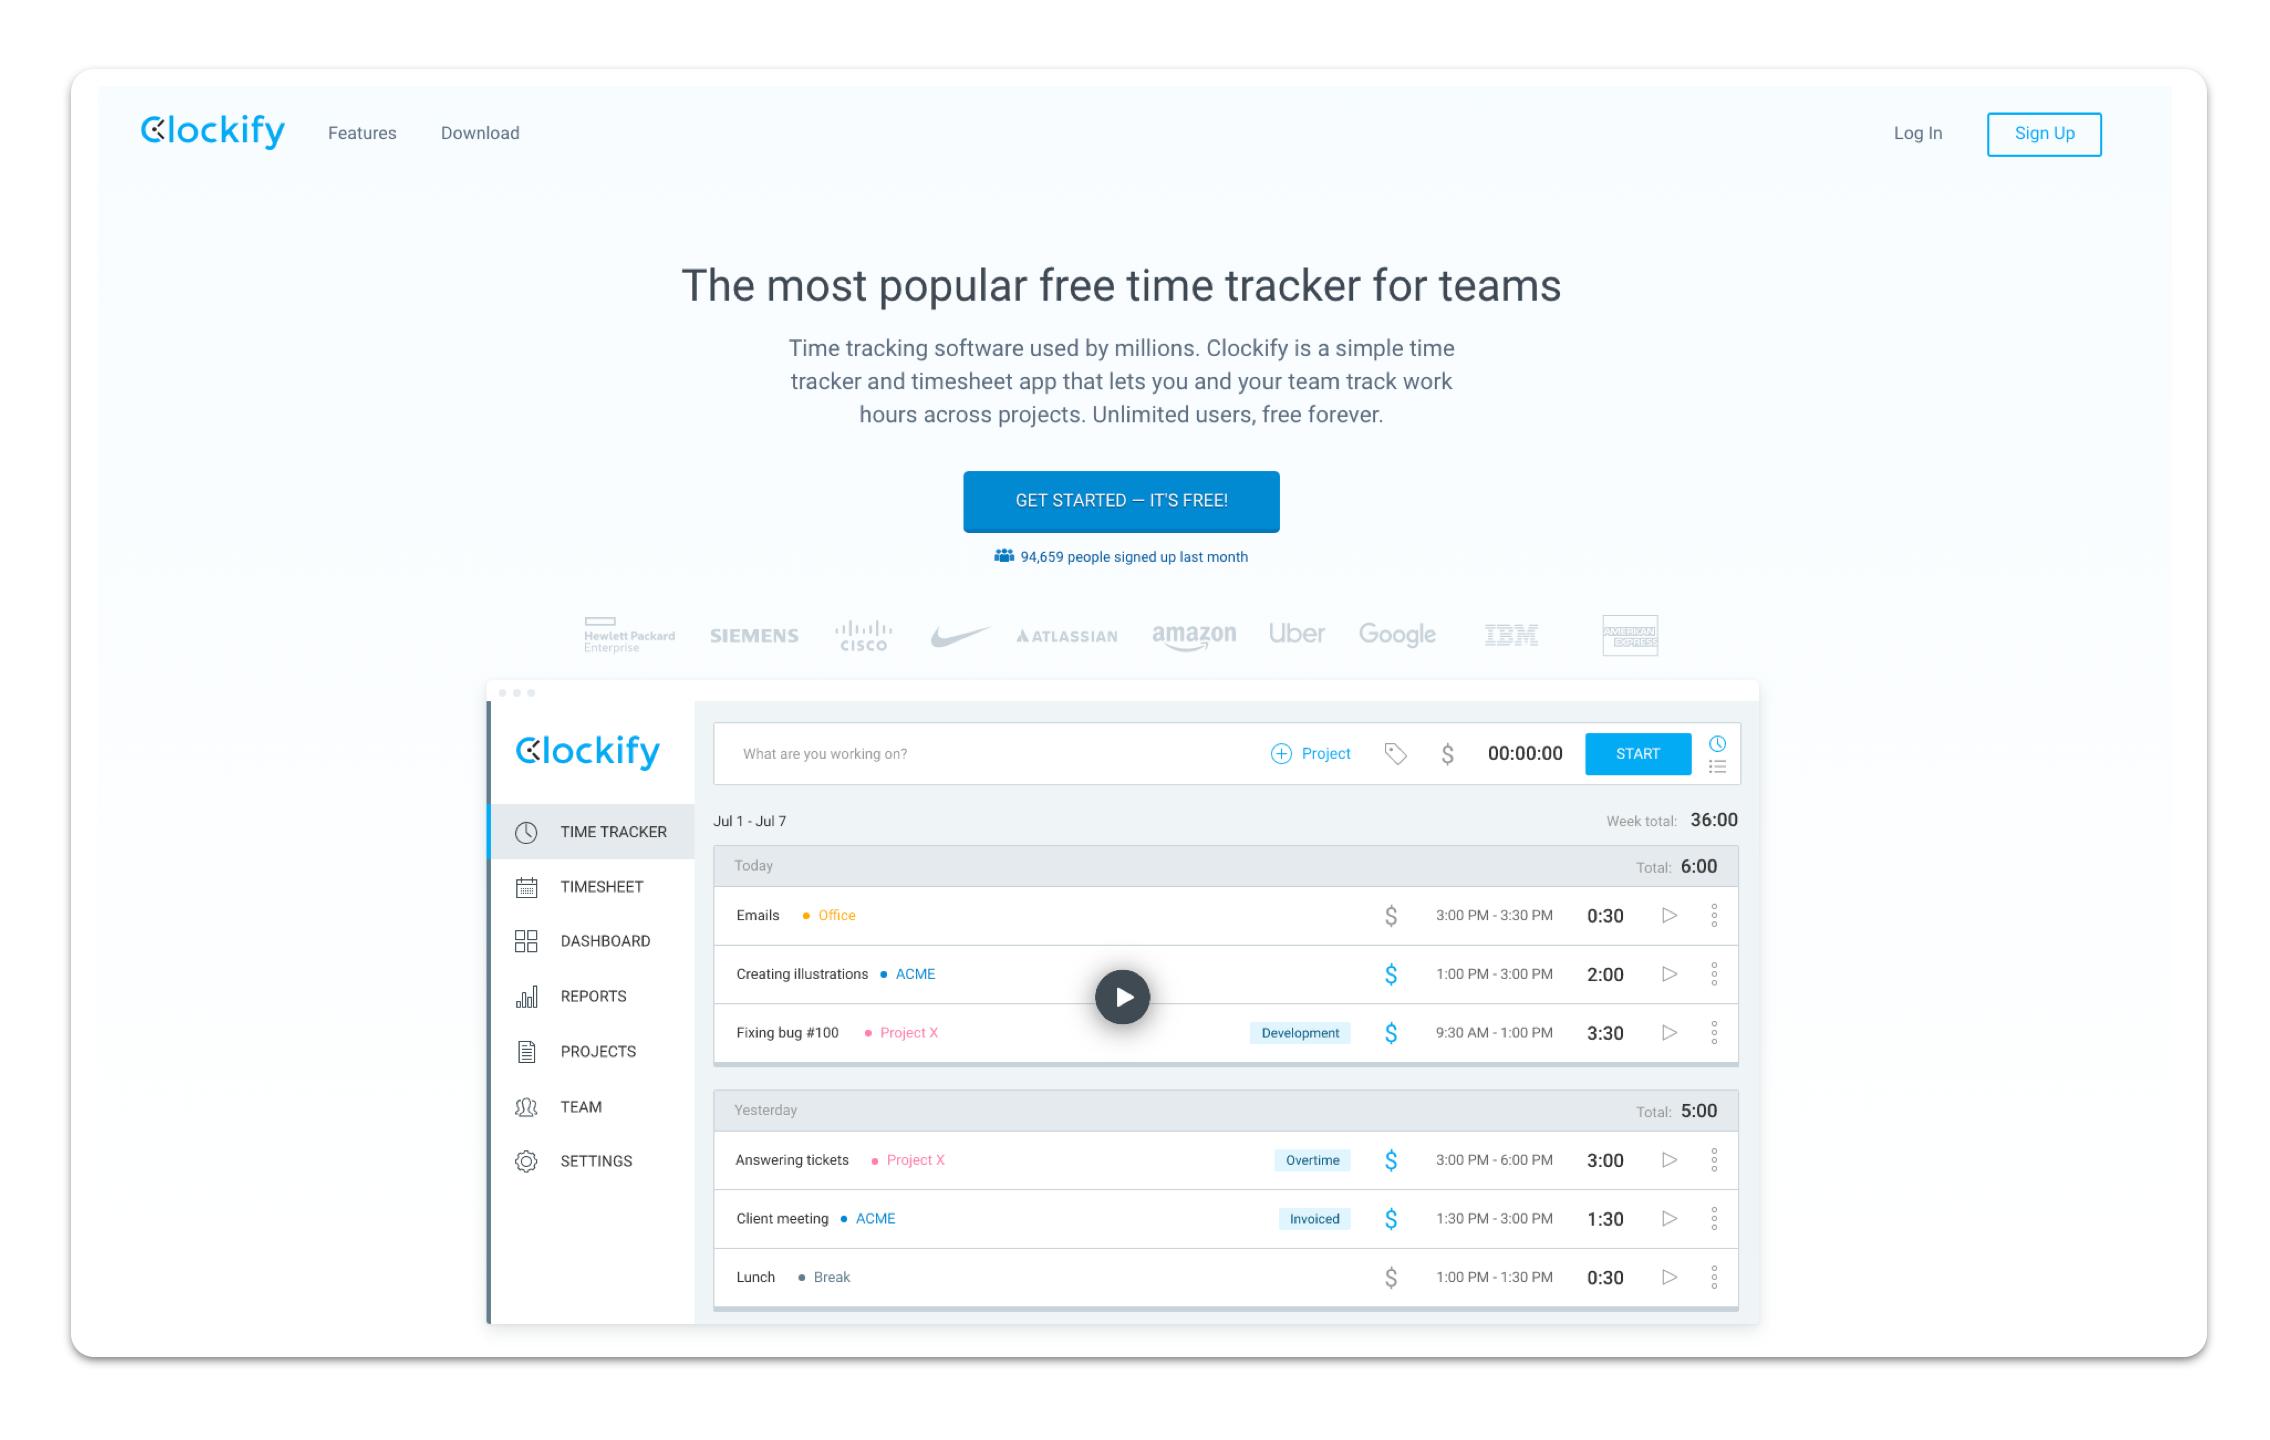 A screenshot of the Clockify app